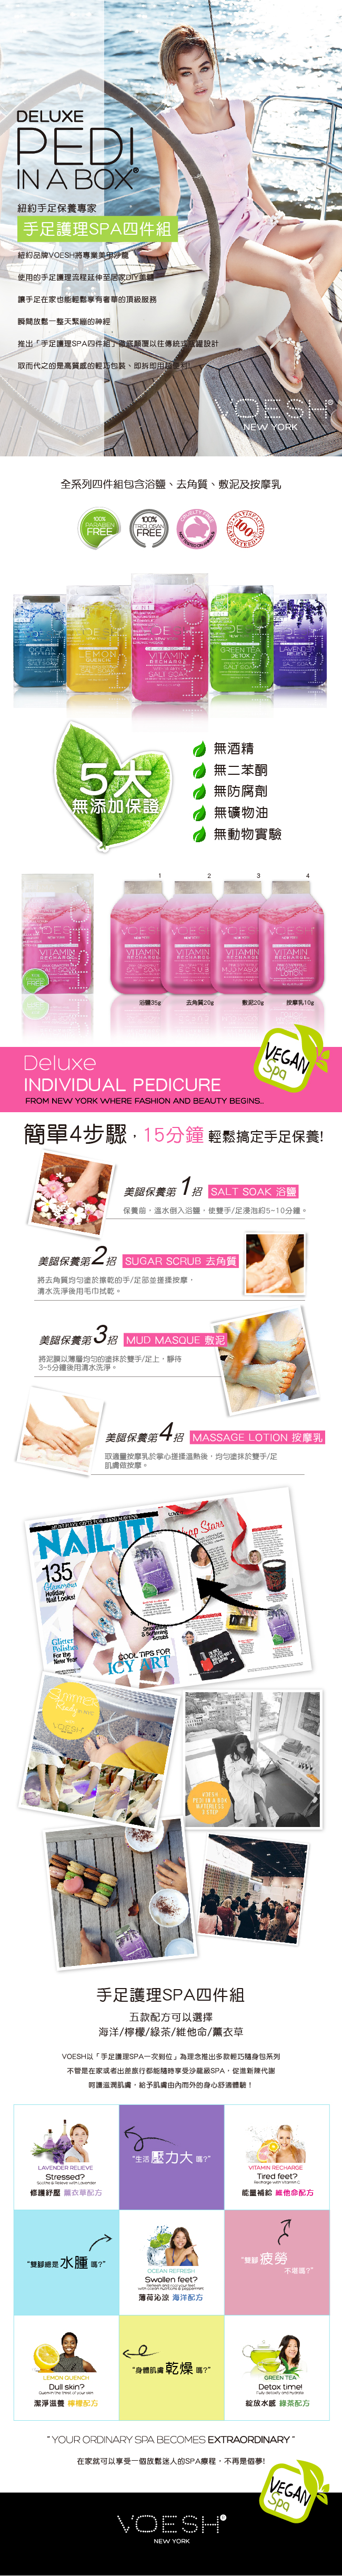 VOESH, VOESH台灣, 紐約手足保養專家, 手足護理SPA四件組, 居家護理, 浴鹽, 去角質, 泥膜, 按摩乳, 手足保養, VOESH哪裡買, 試用, 體驗